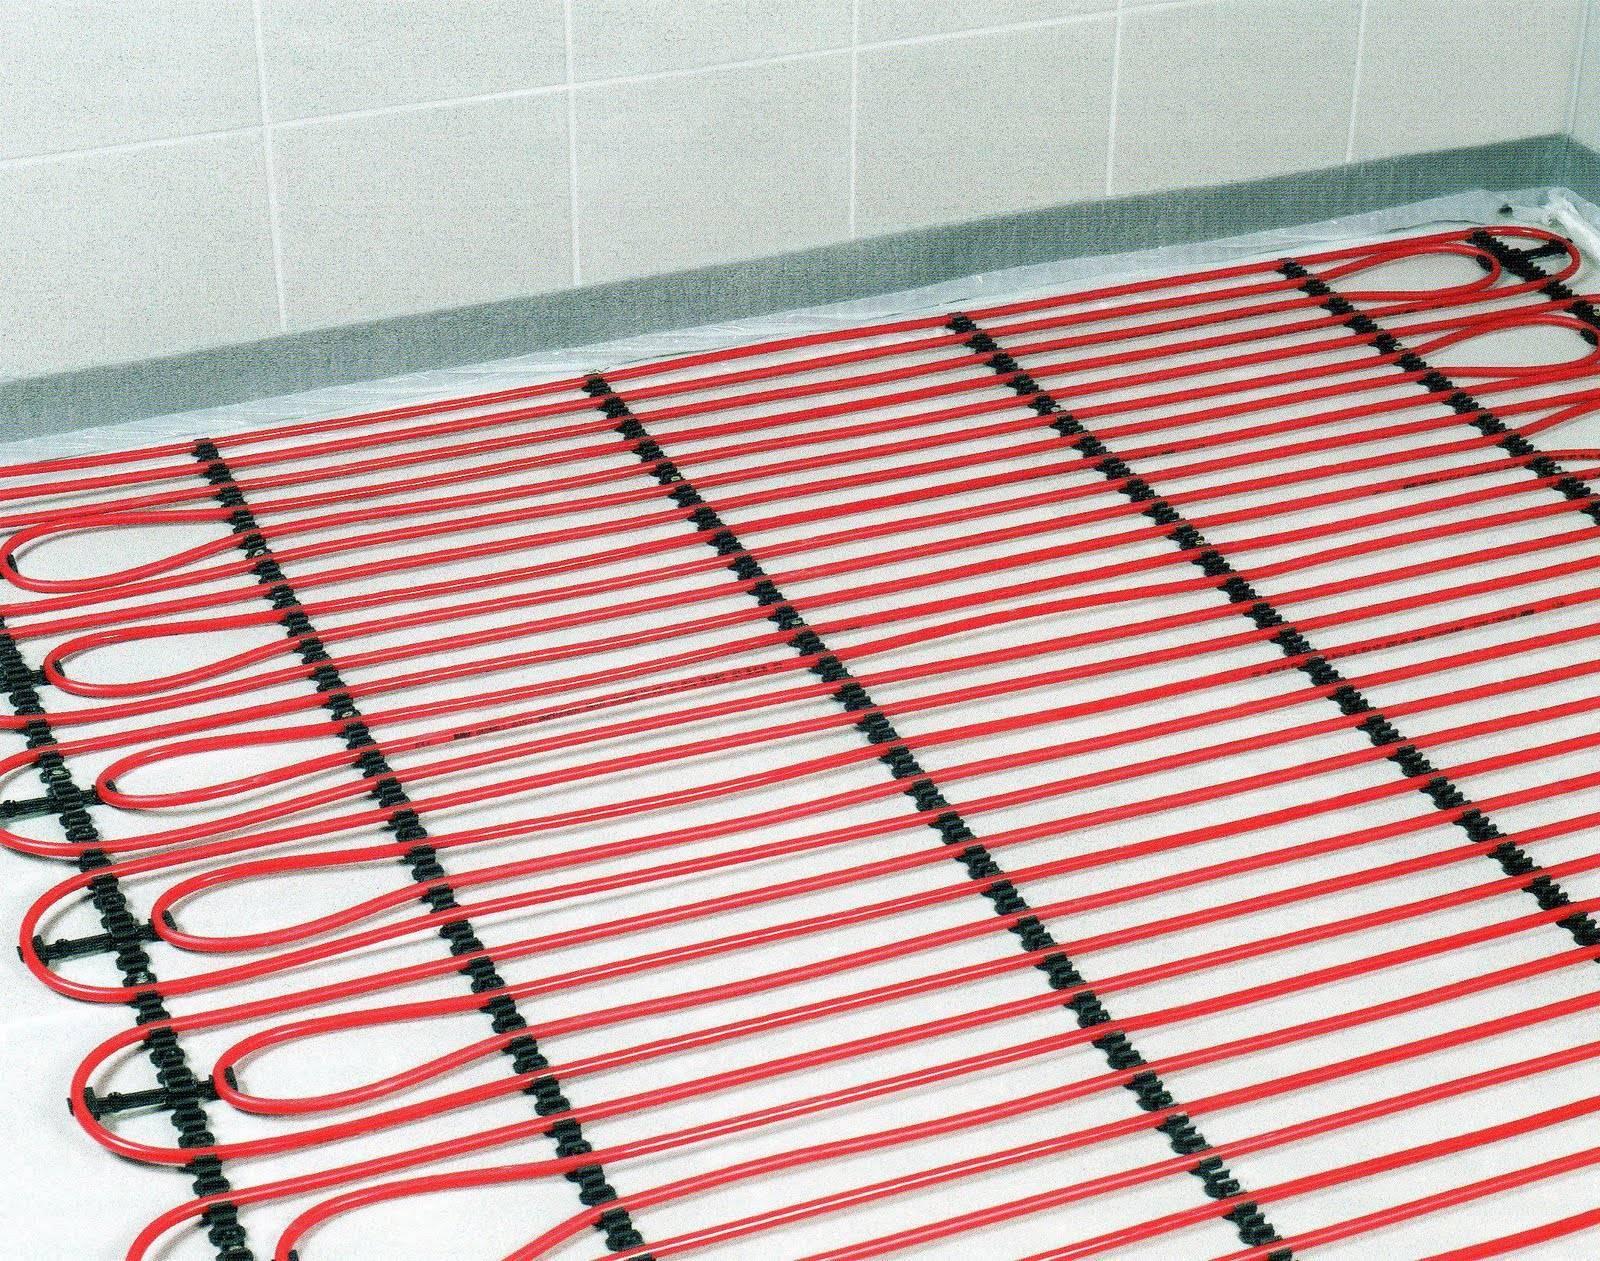 Электрический теплый пол под плитку: правила укладки и монтажа